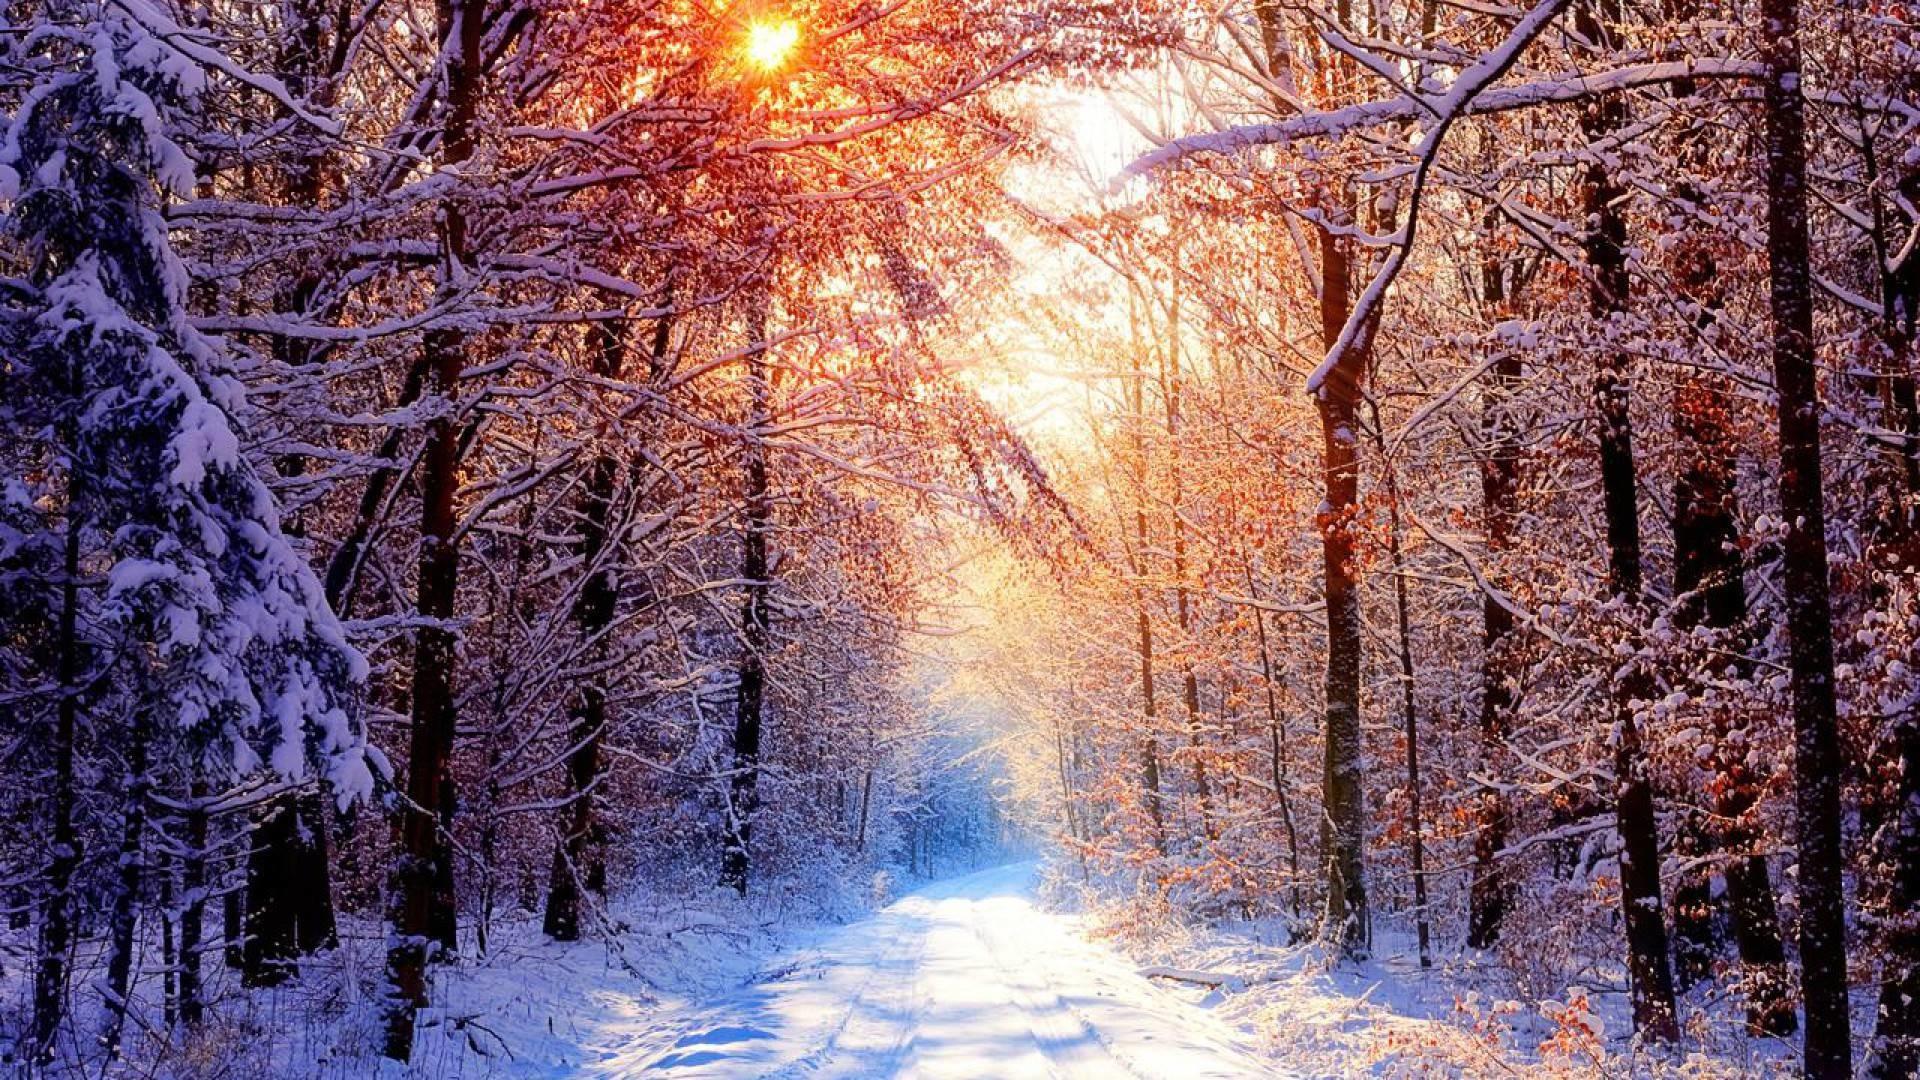 winter forest desktop wallpaper 26 images